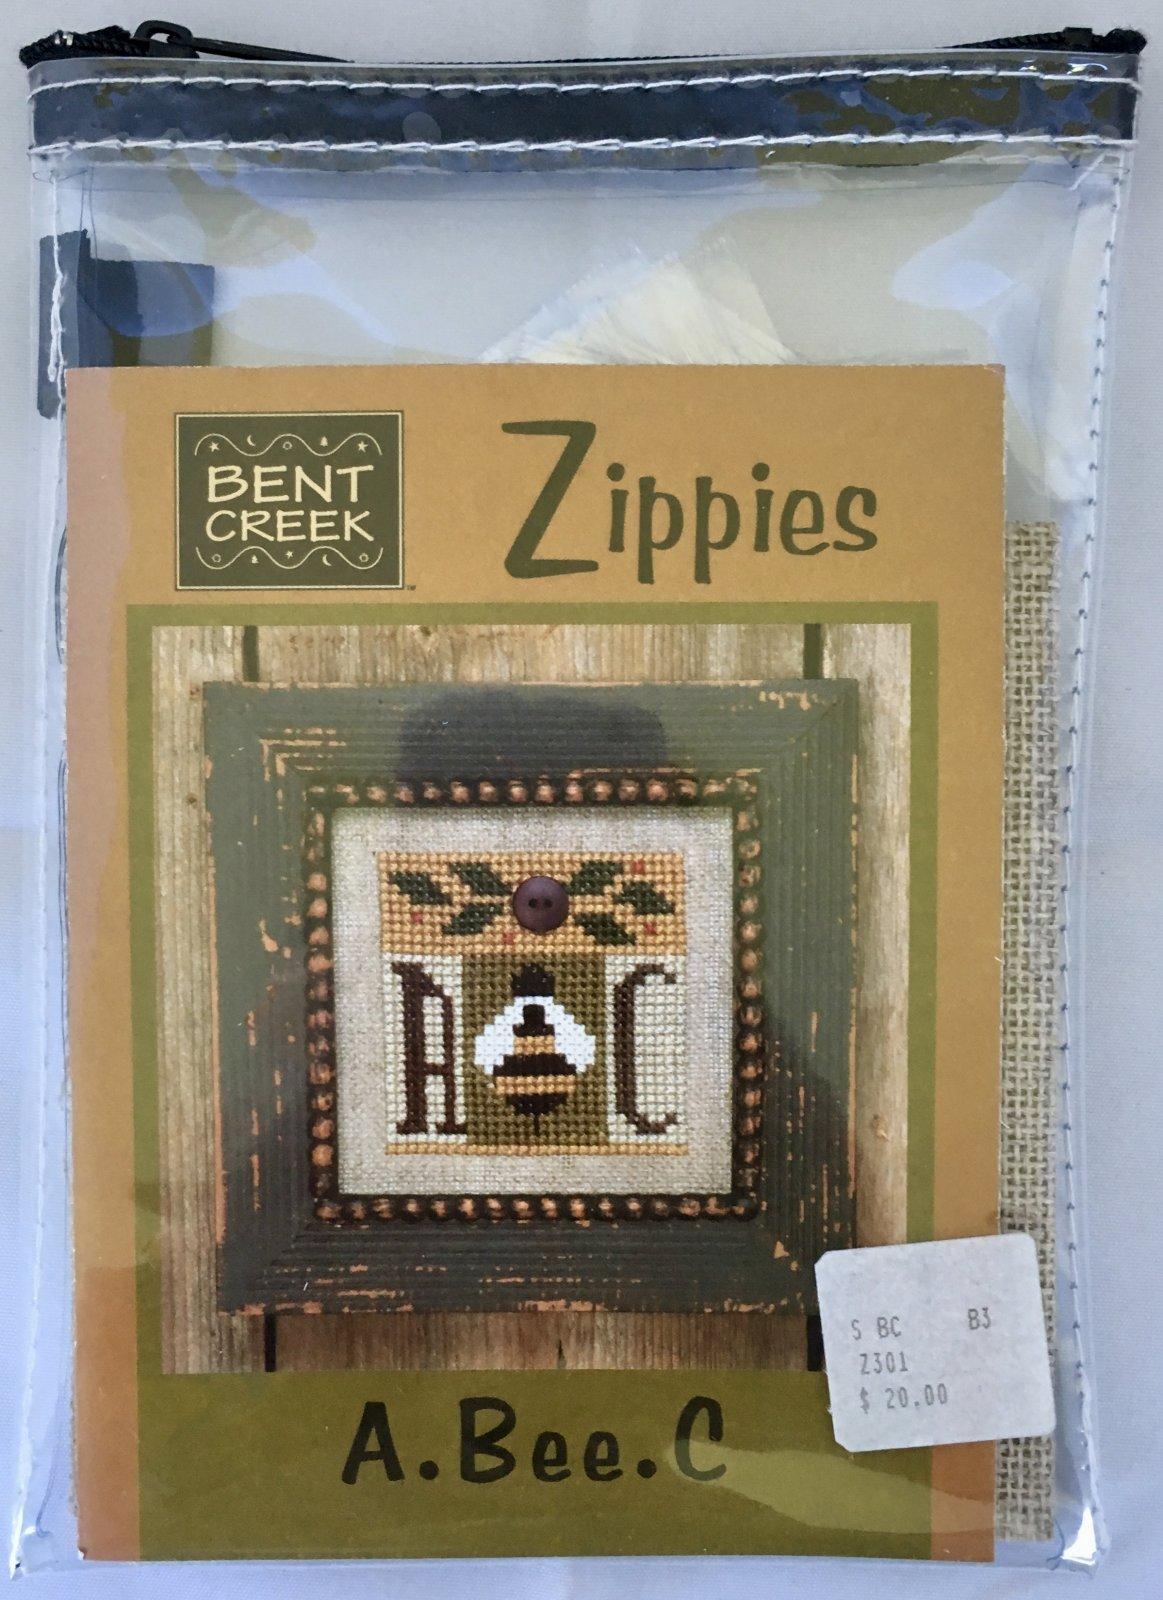 Bent Creek: A. Bee C. Zippies Kit